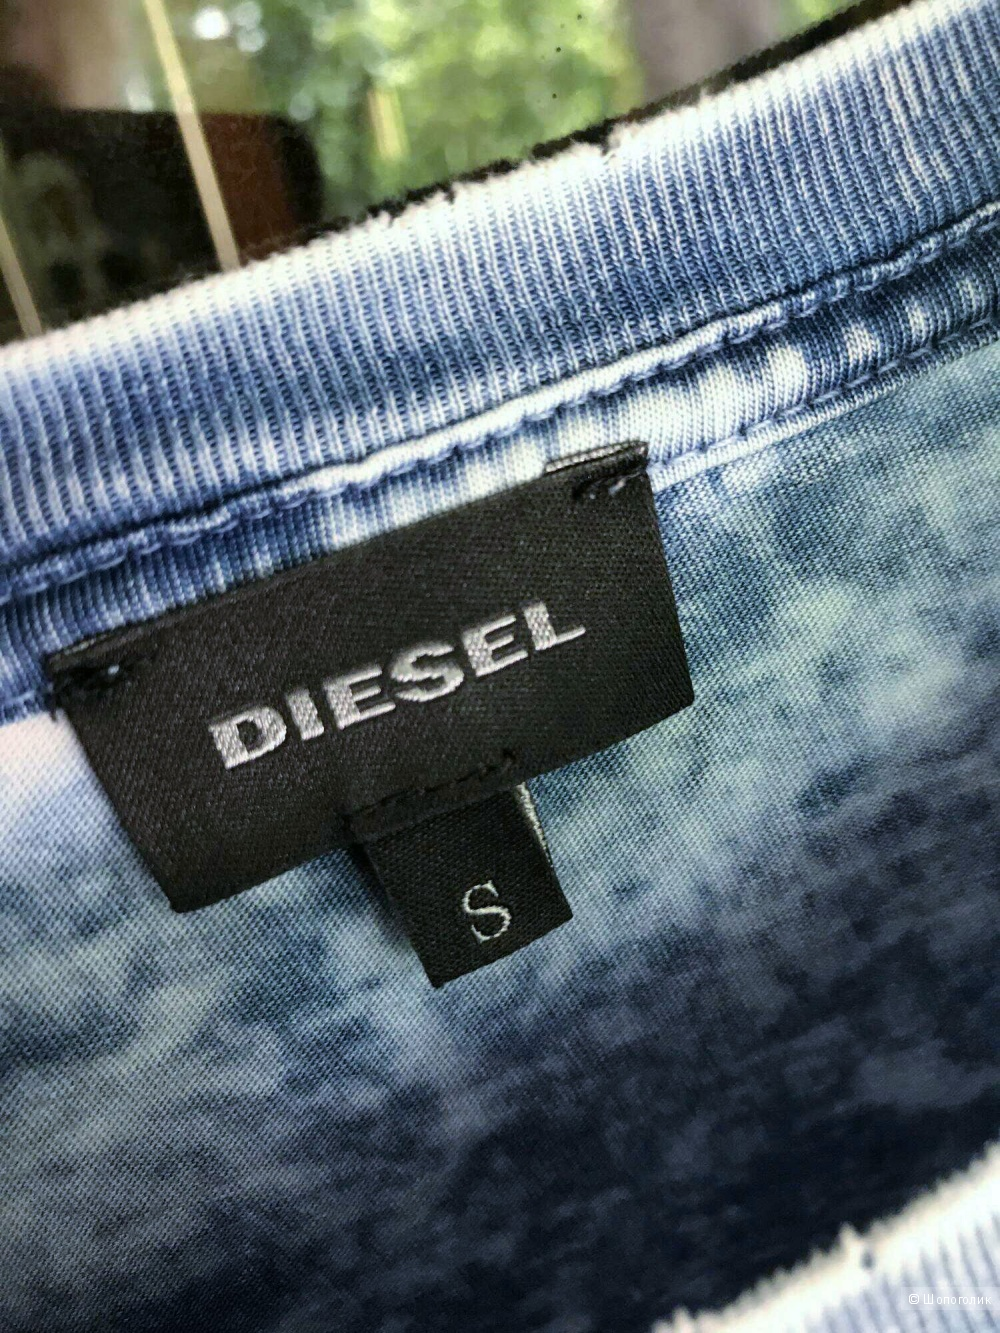 Футболка Diesel S/M